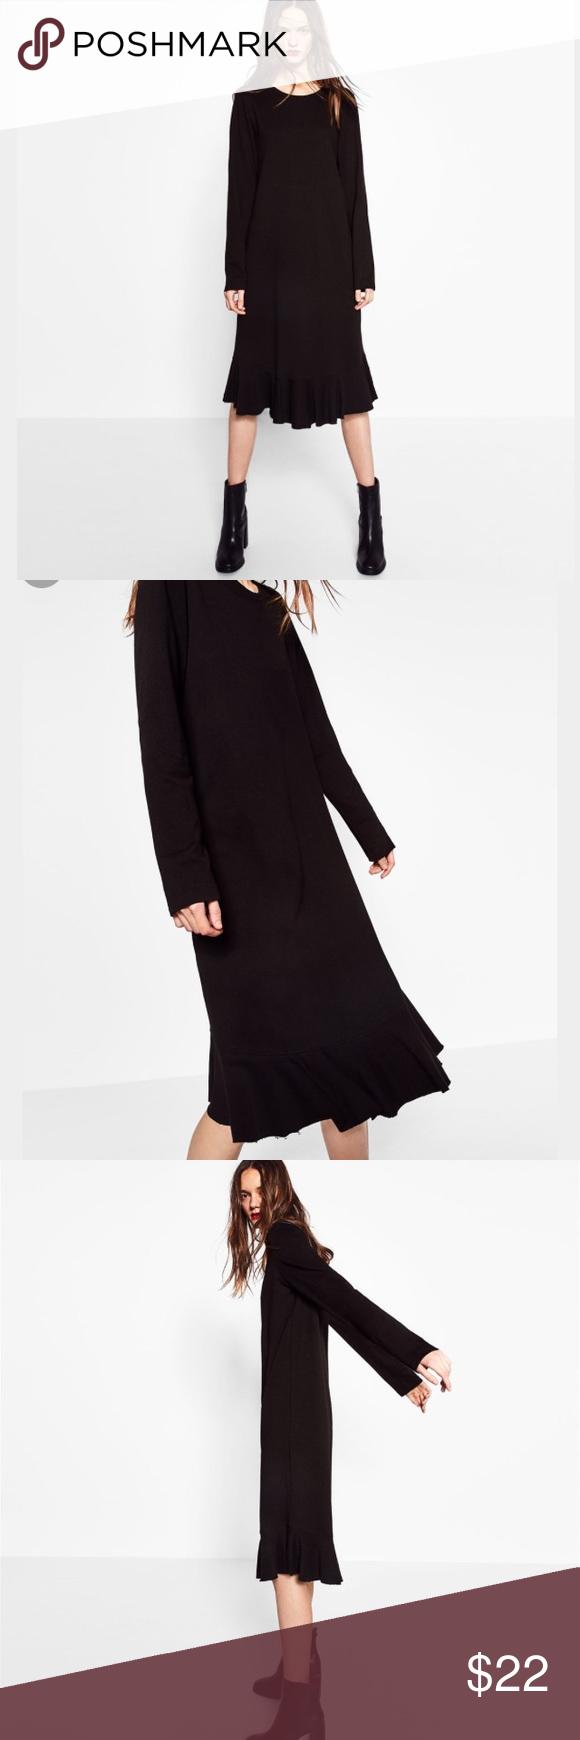 Zara Plush Dress With Ruffle Bottom Dress Brands Zara Black Zara [ 1740 x 580 Pixel ]